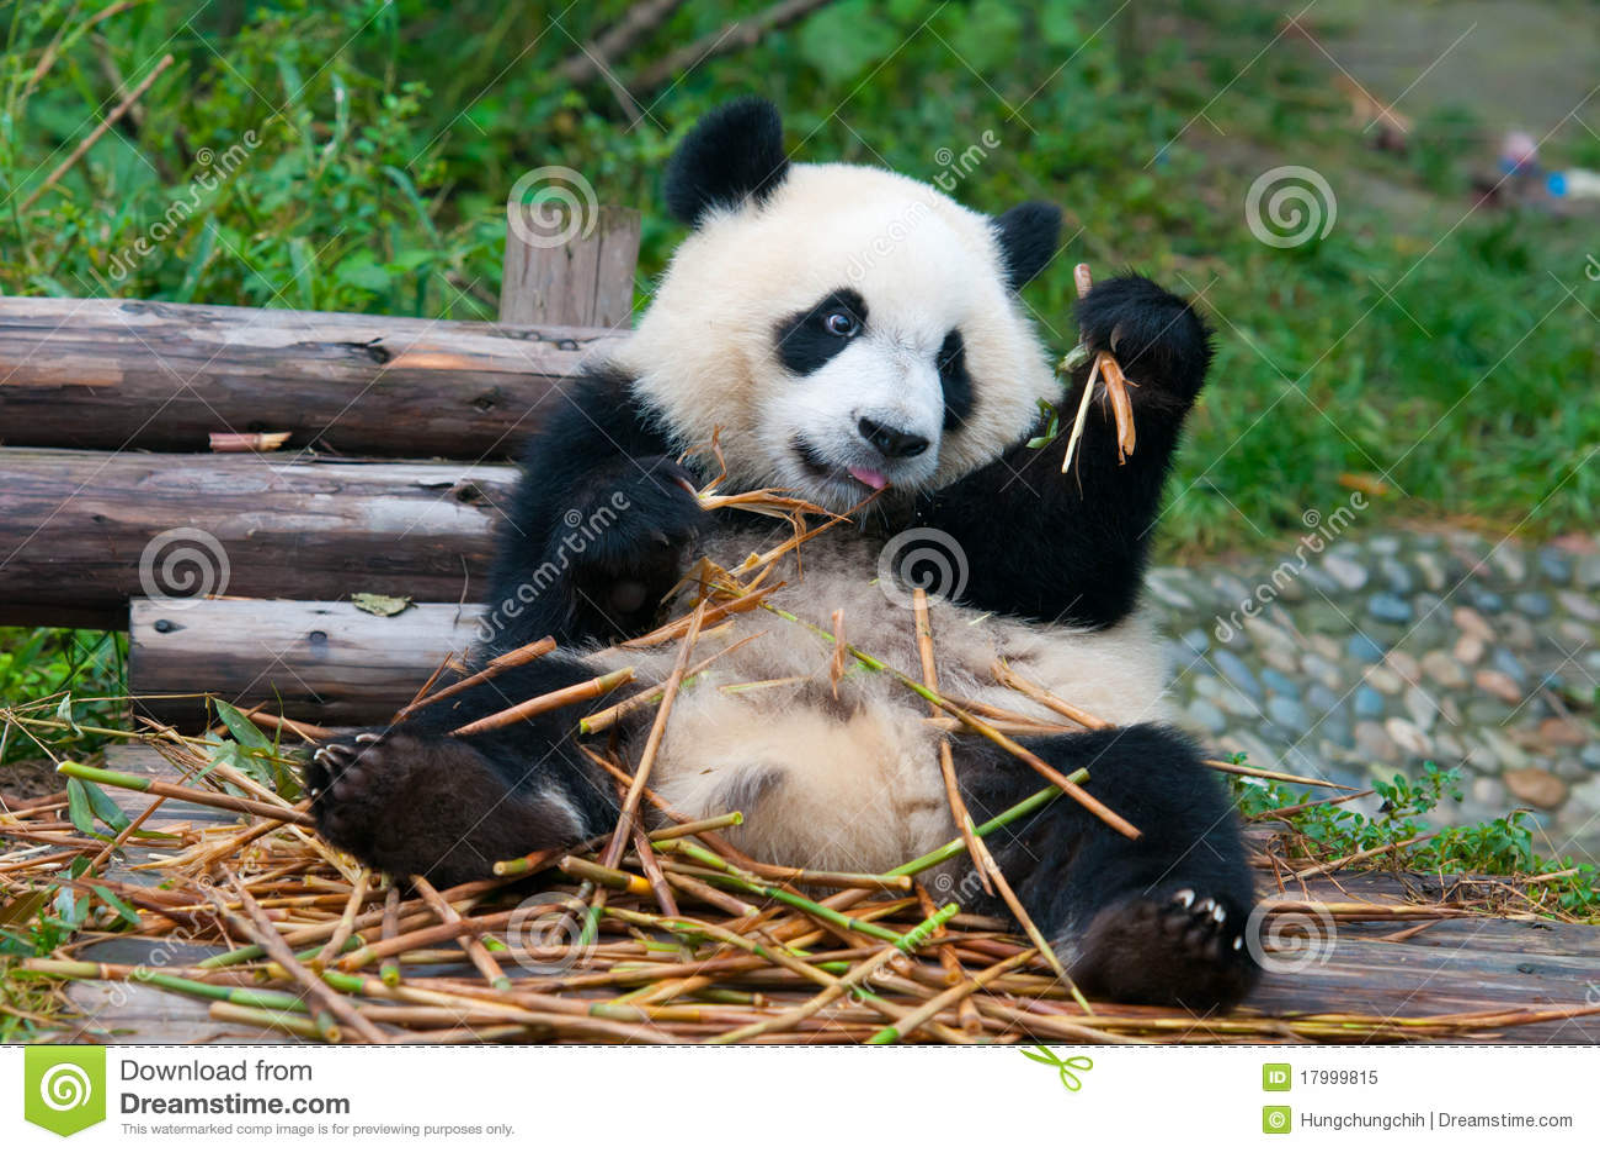 Giant Panda Bear Eating Bamboo Royalty Free Stock Photo ... Mammals Clipart Black And White